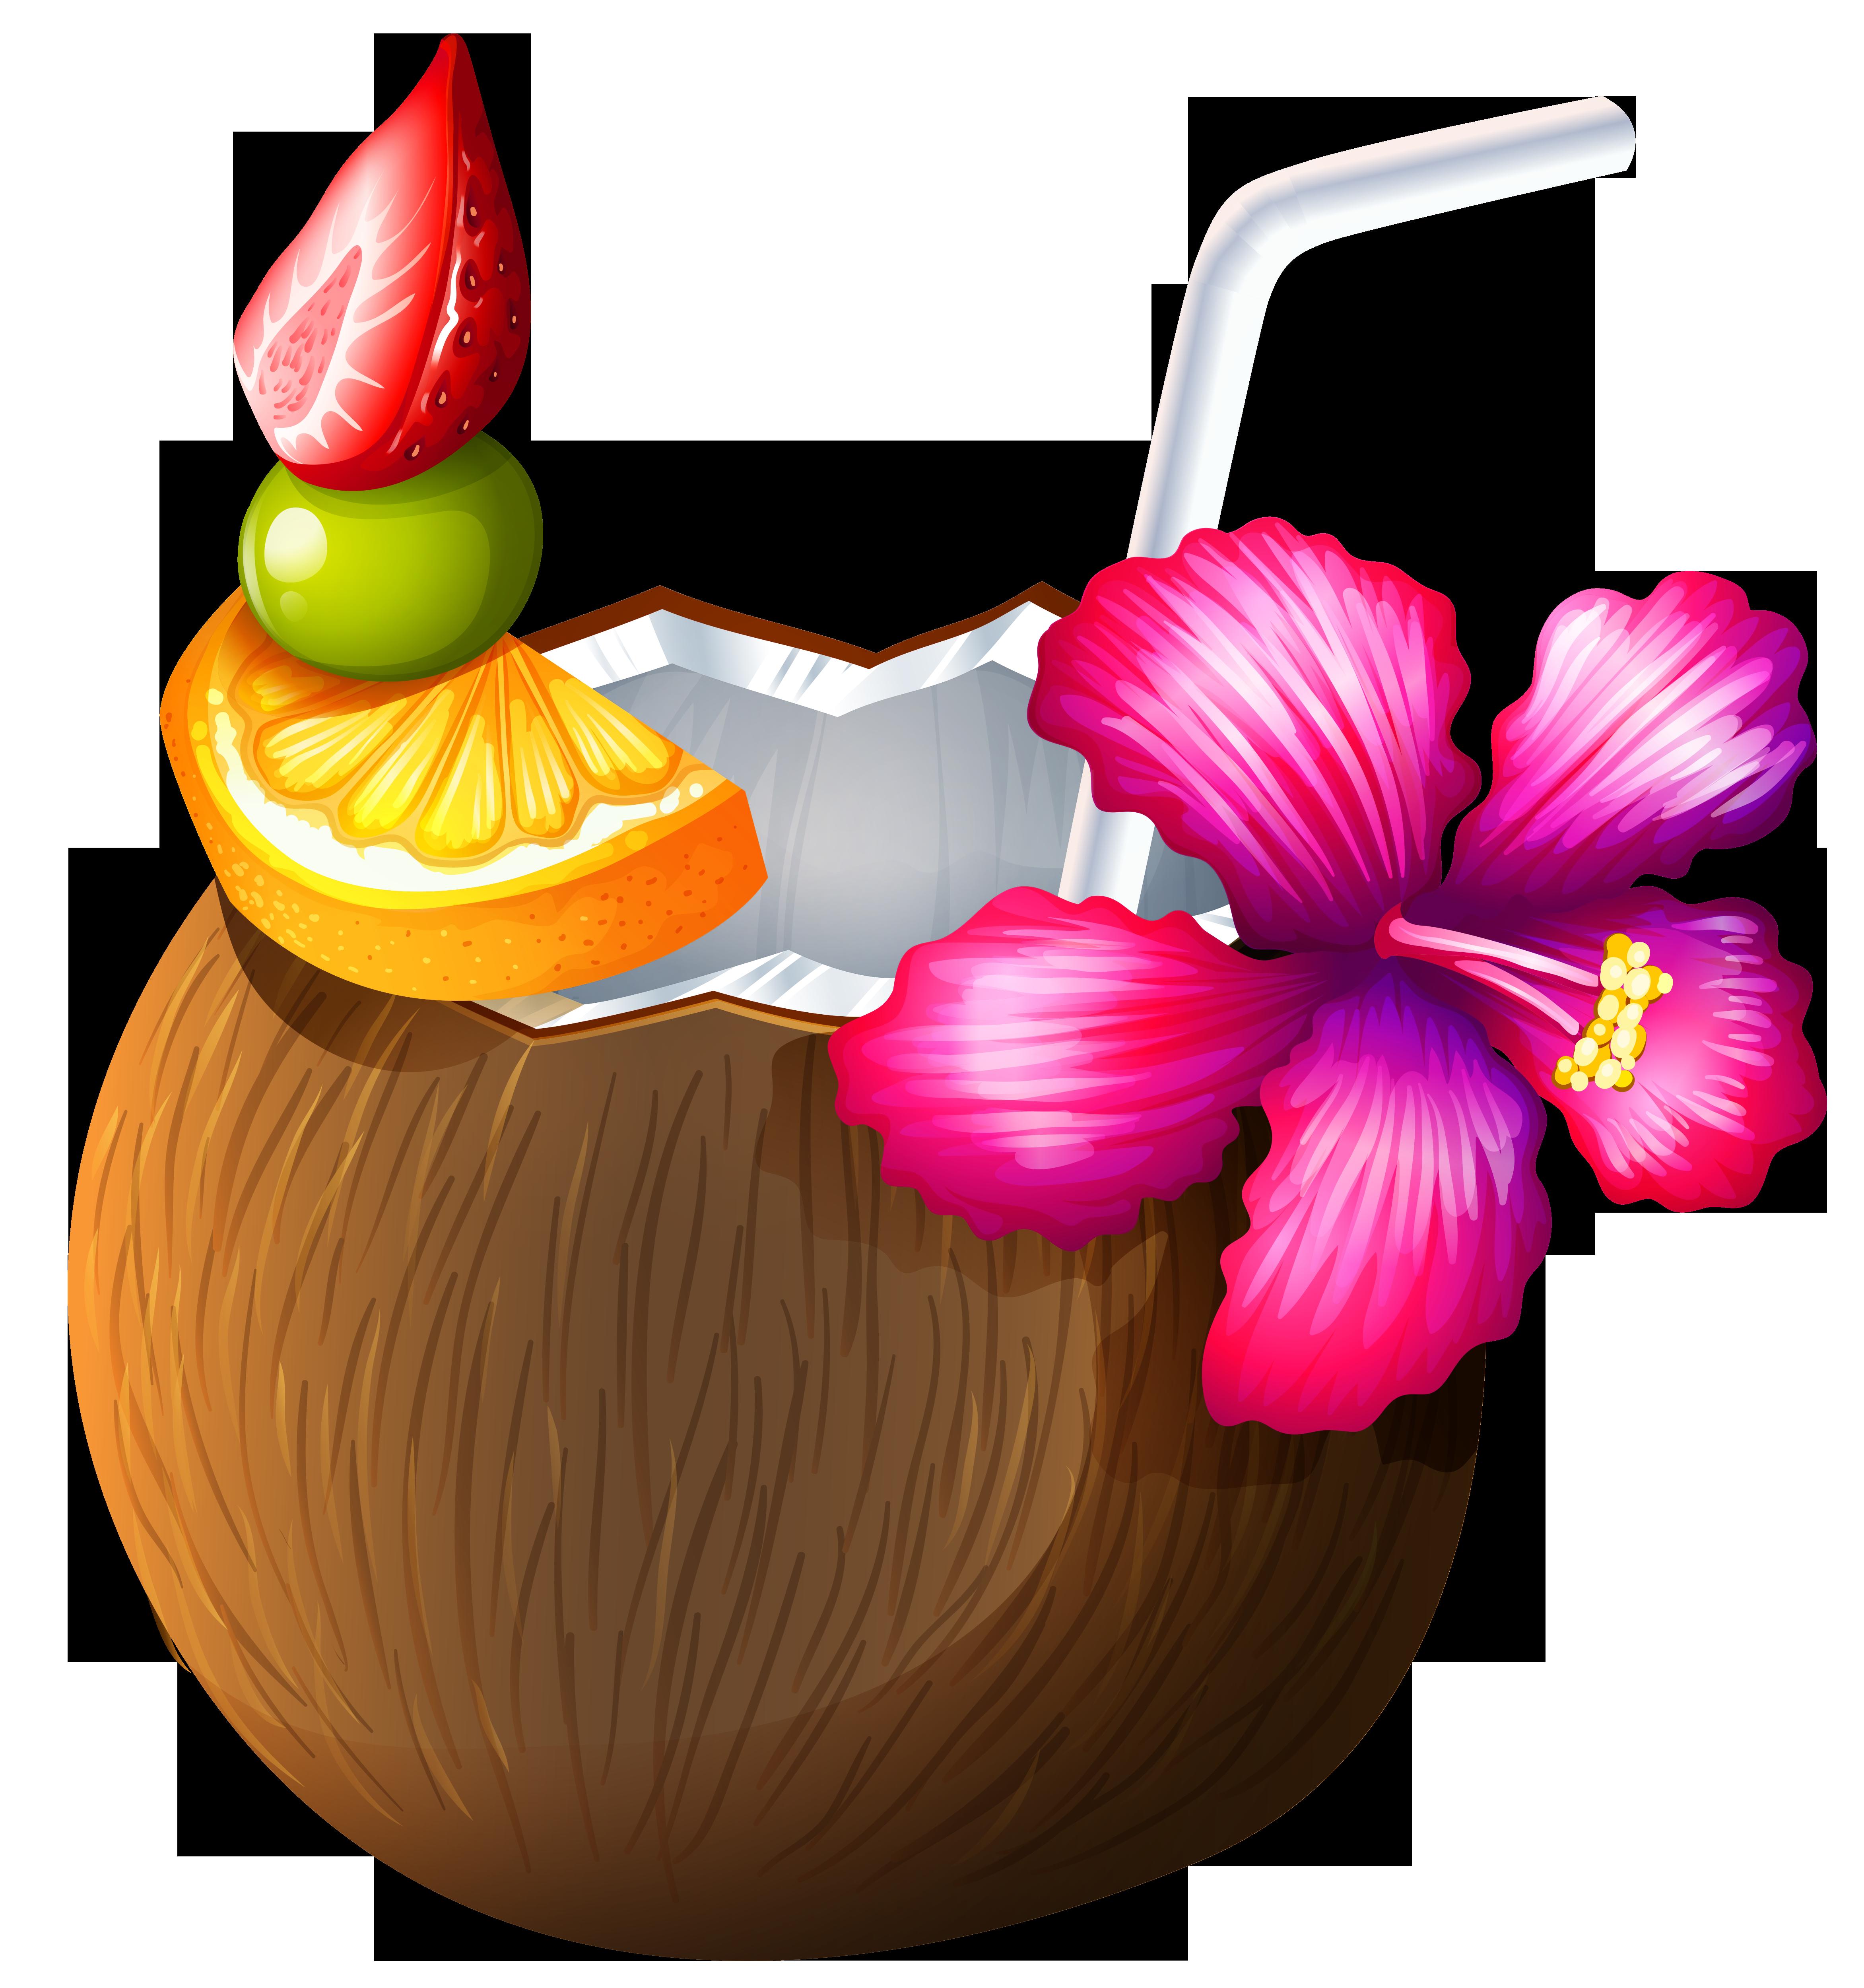 Coconut Drink Clip Art Summer Cicekli Desenler Cicek Meyve